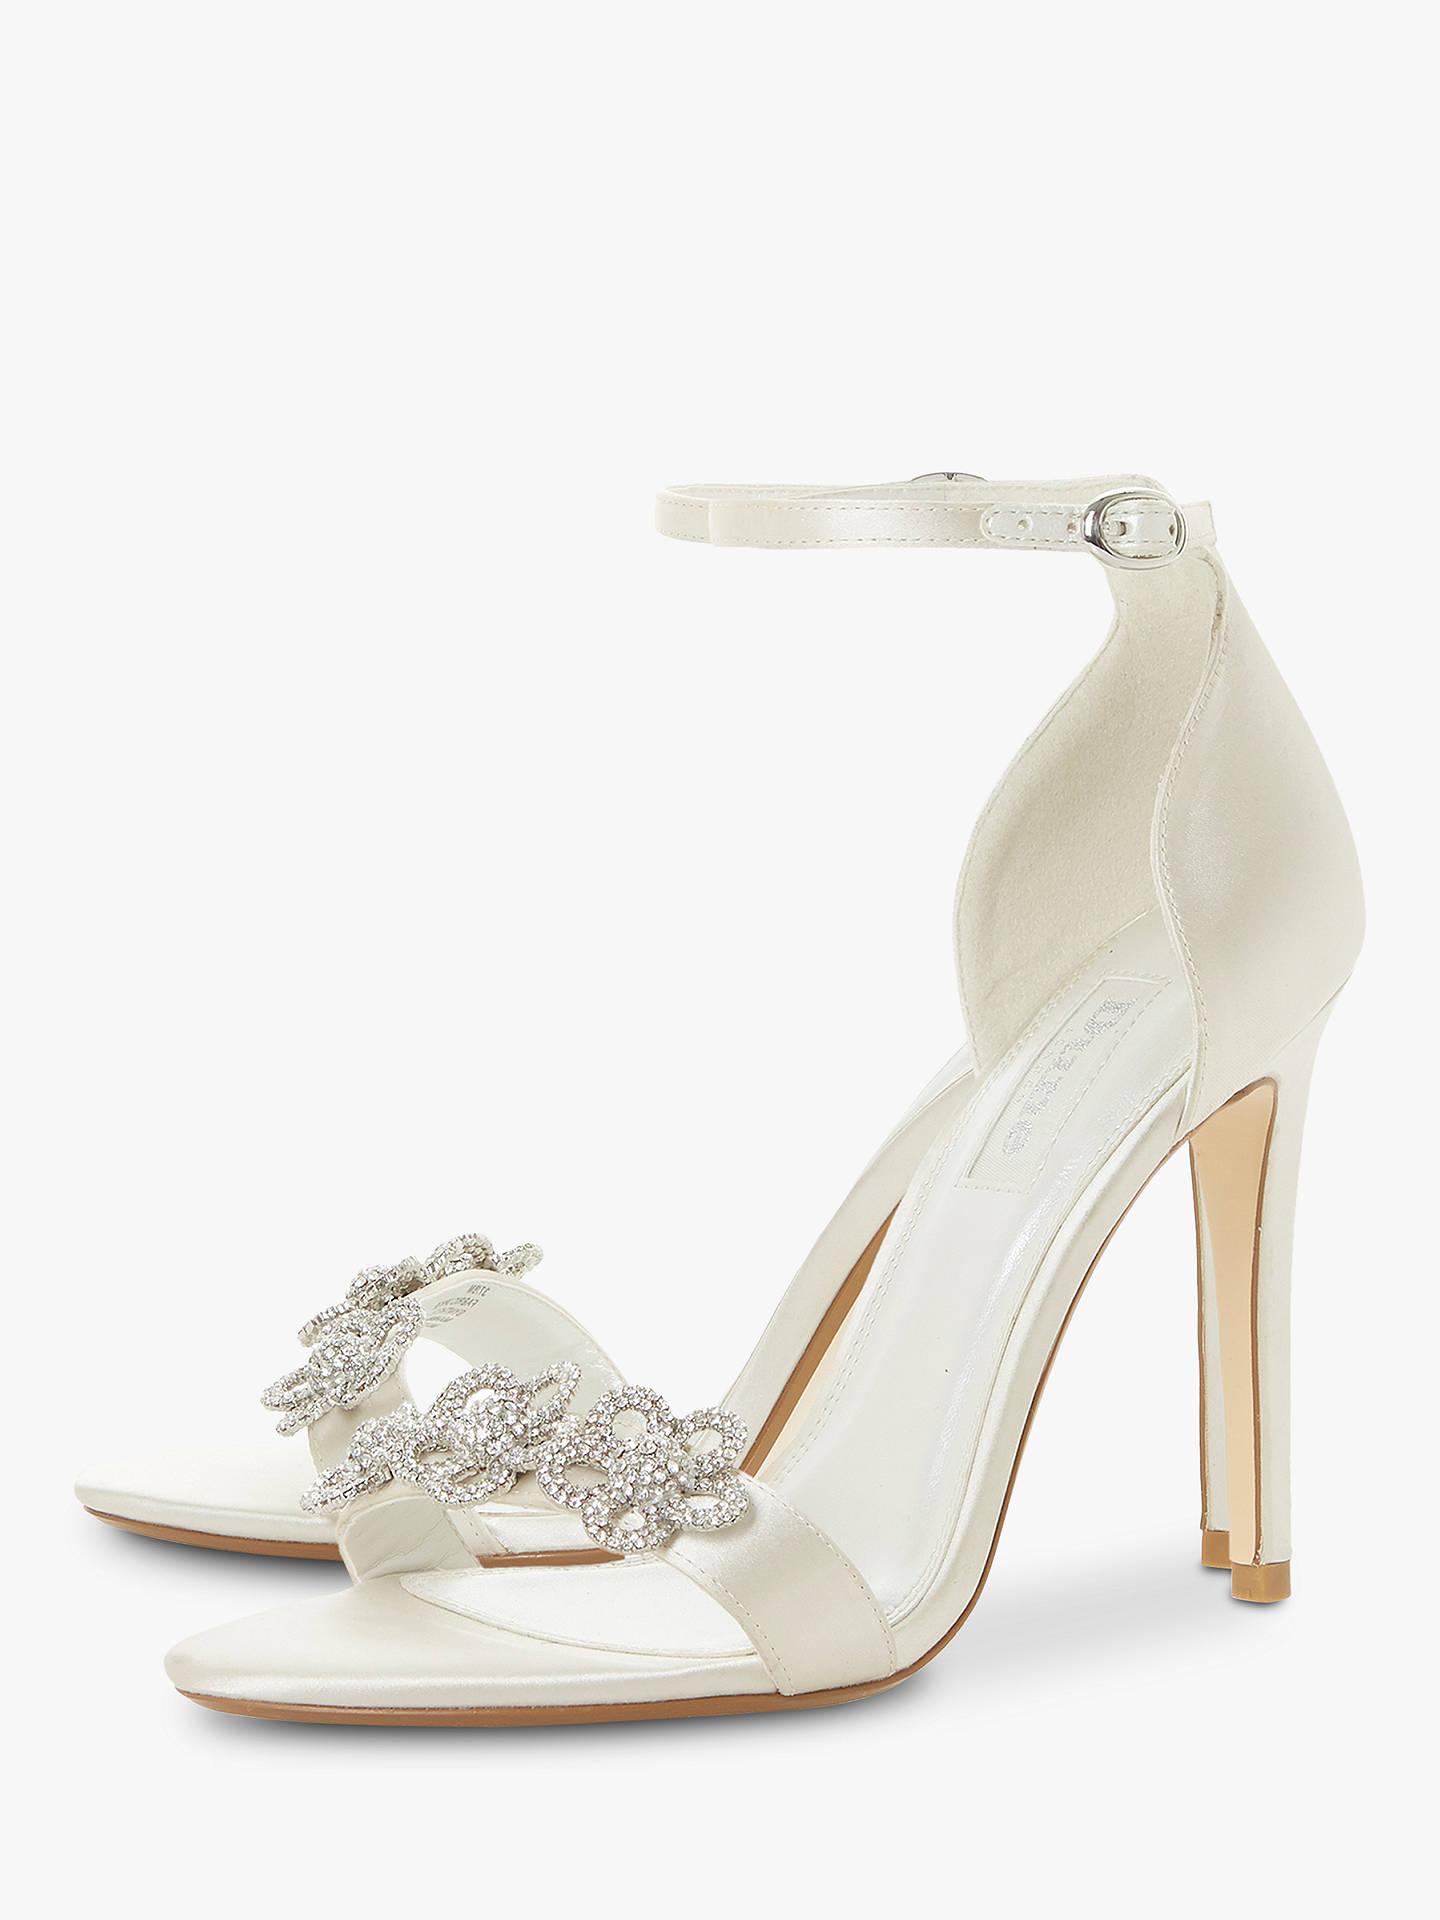 887b95ed036 ... Buy Dune Marry Me Bridal Collection Embellished Stiletto Heel Sandals